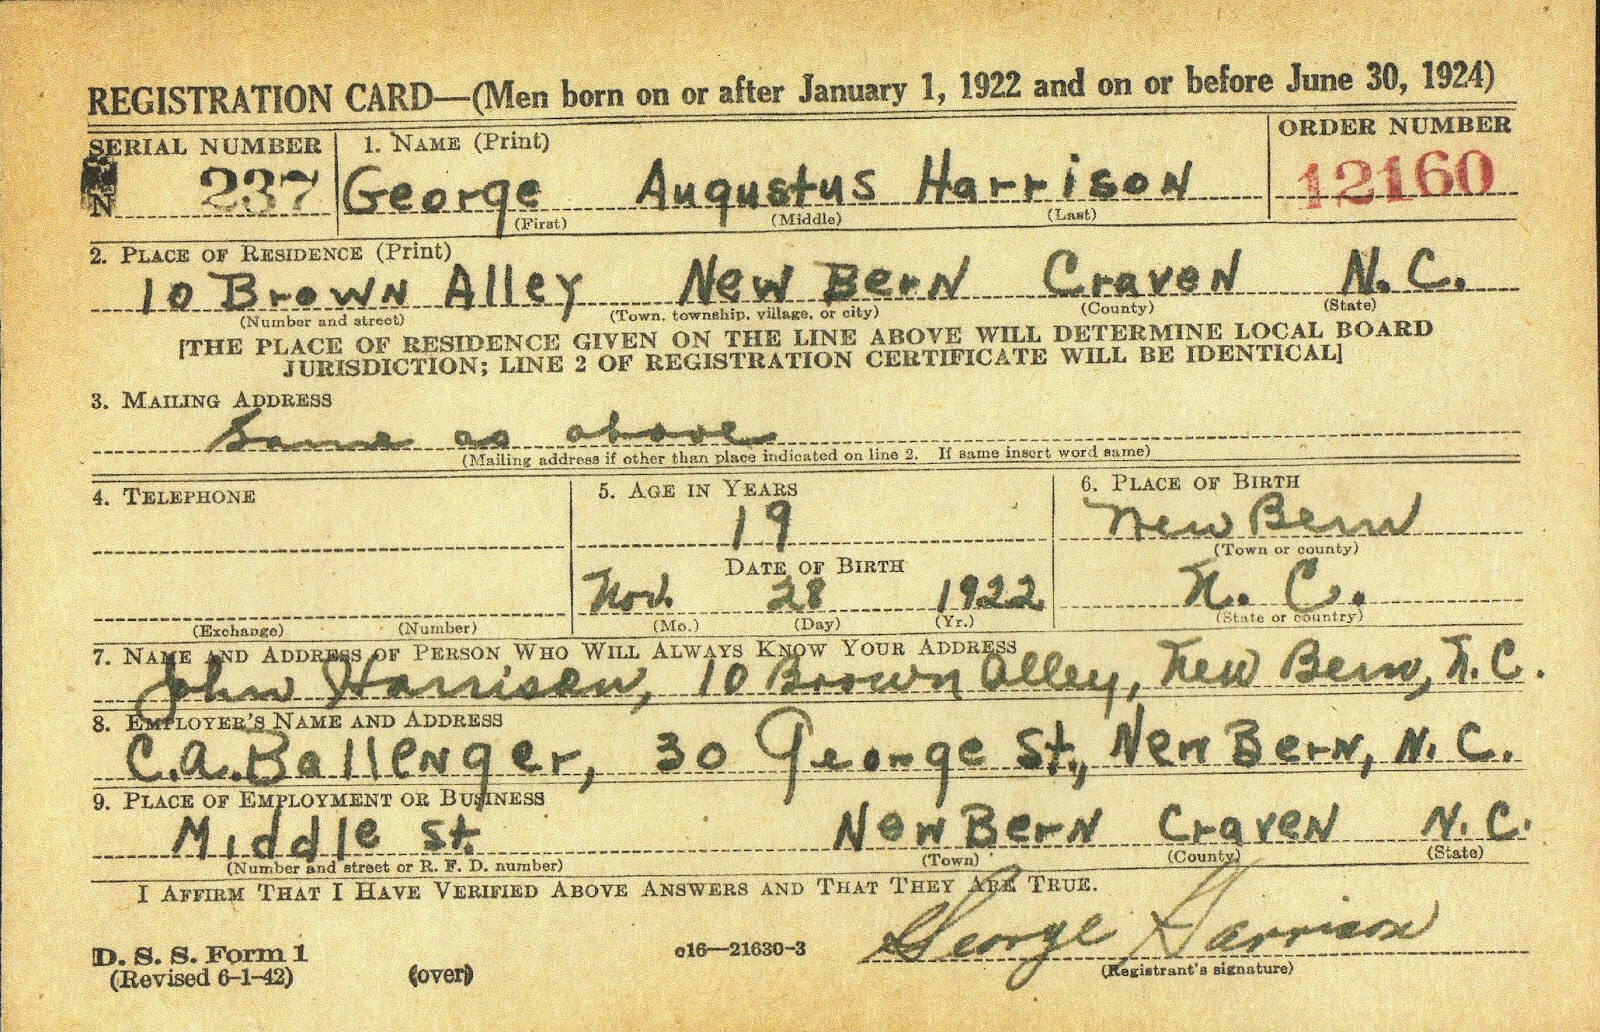 World War 2 Identity Card Template ] - Replica Of A World Throughout World War 2 Identity Card Template